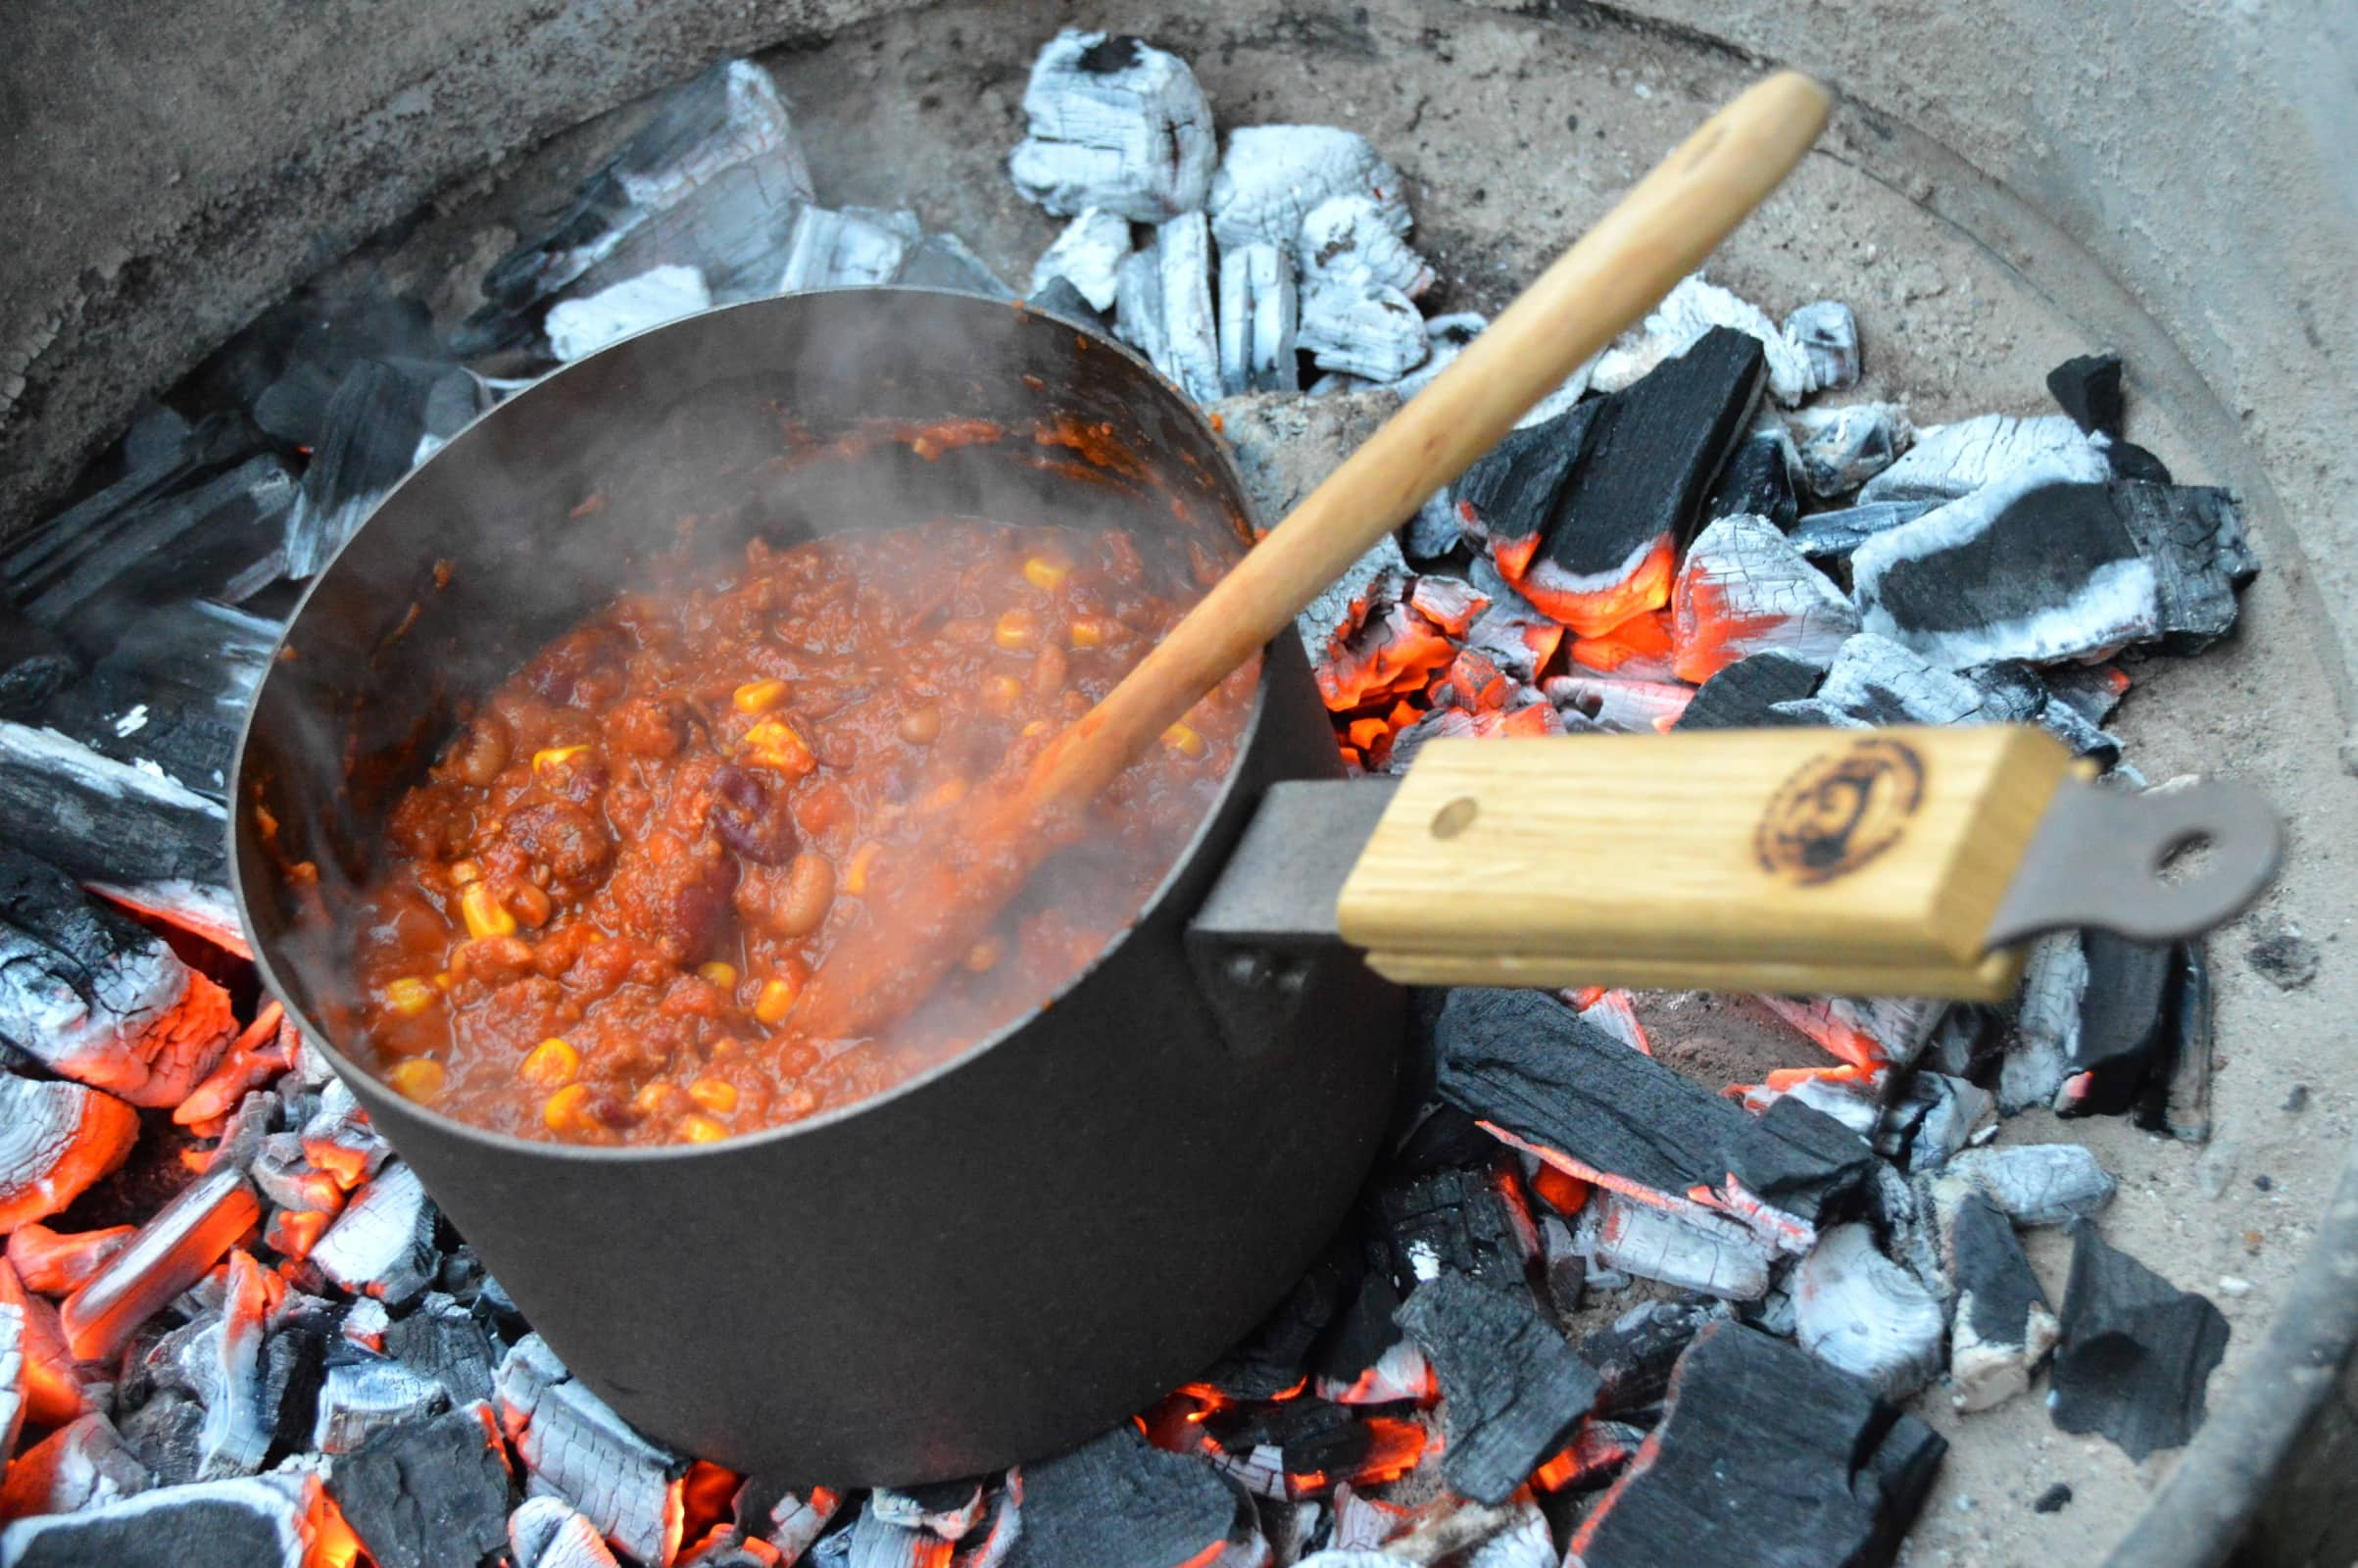 chili con carne auf offener flamme bacon zum steak. Black Bedroom Furniture Sets. Home Design Ideas